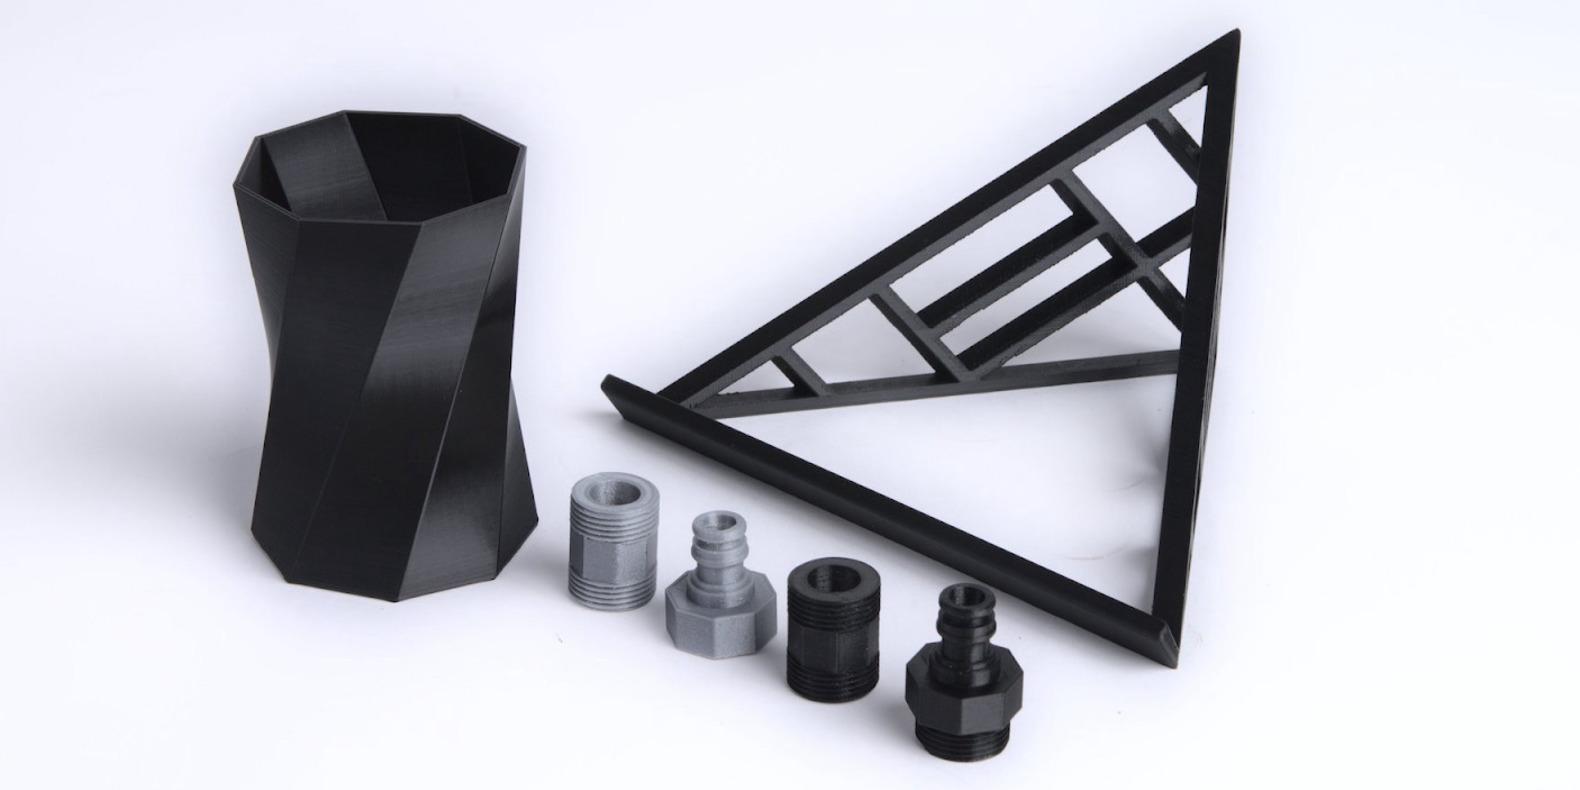 PETG Filament for 3D Printing – Details and Comparison